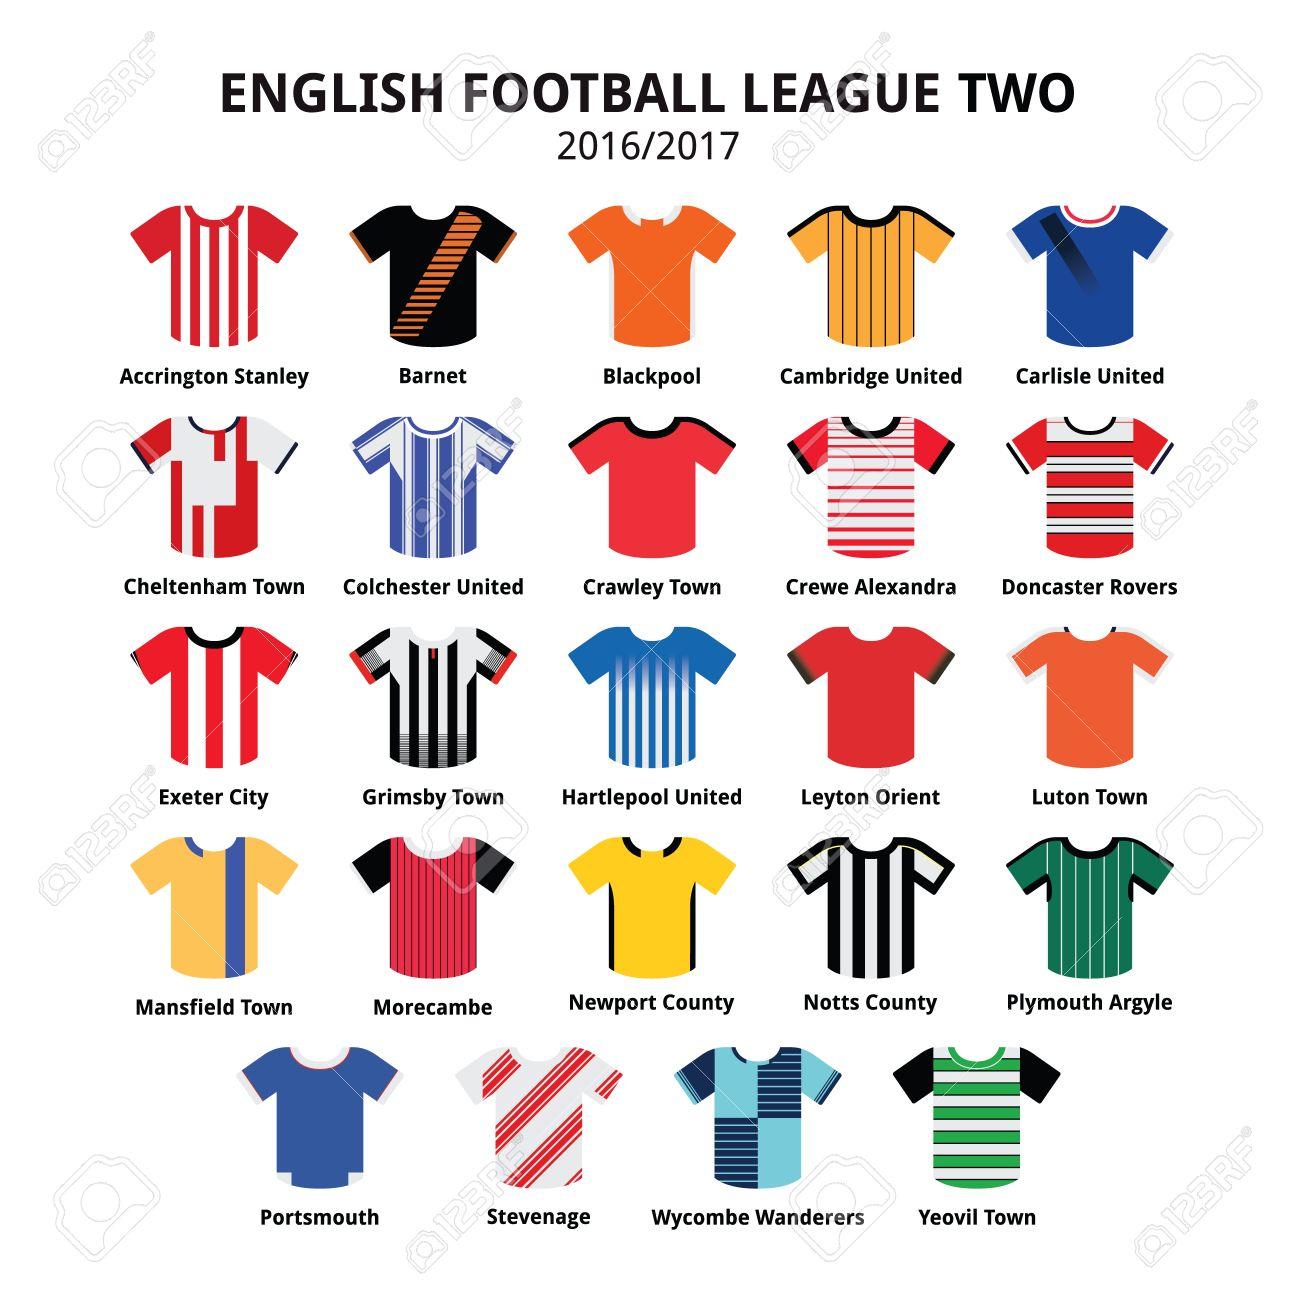 English Football Championship 2016-2017 80